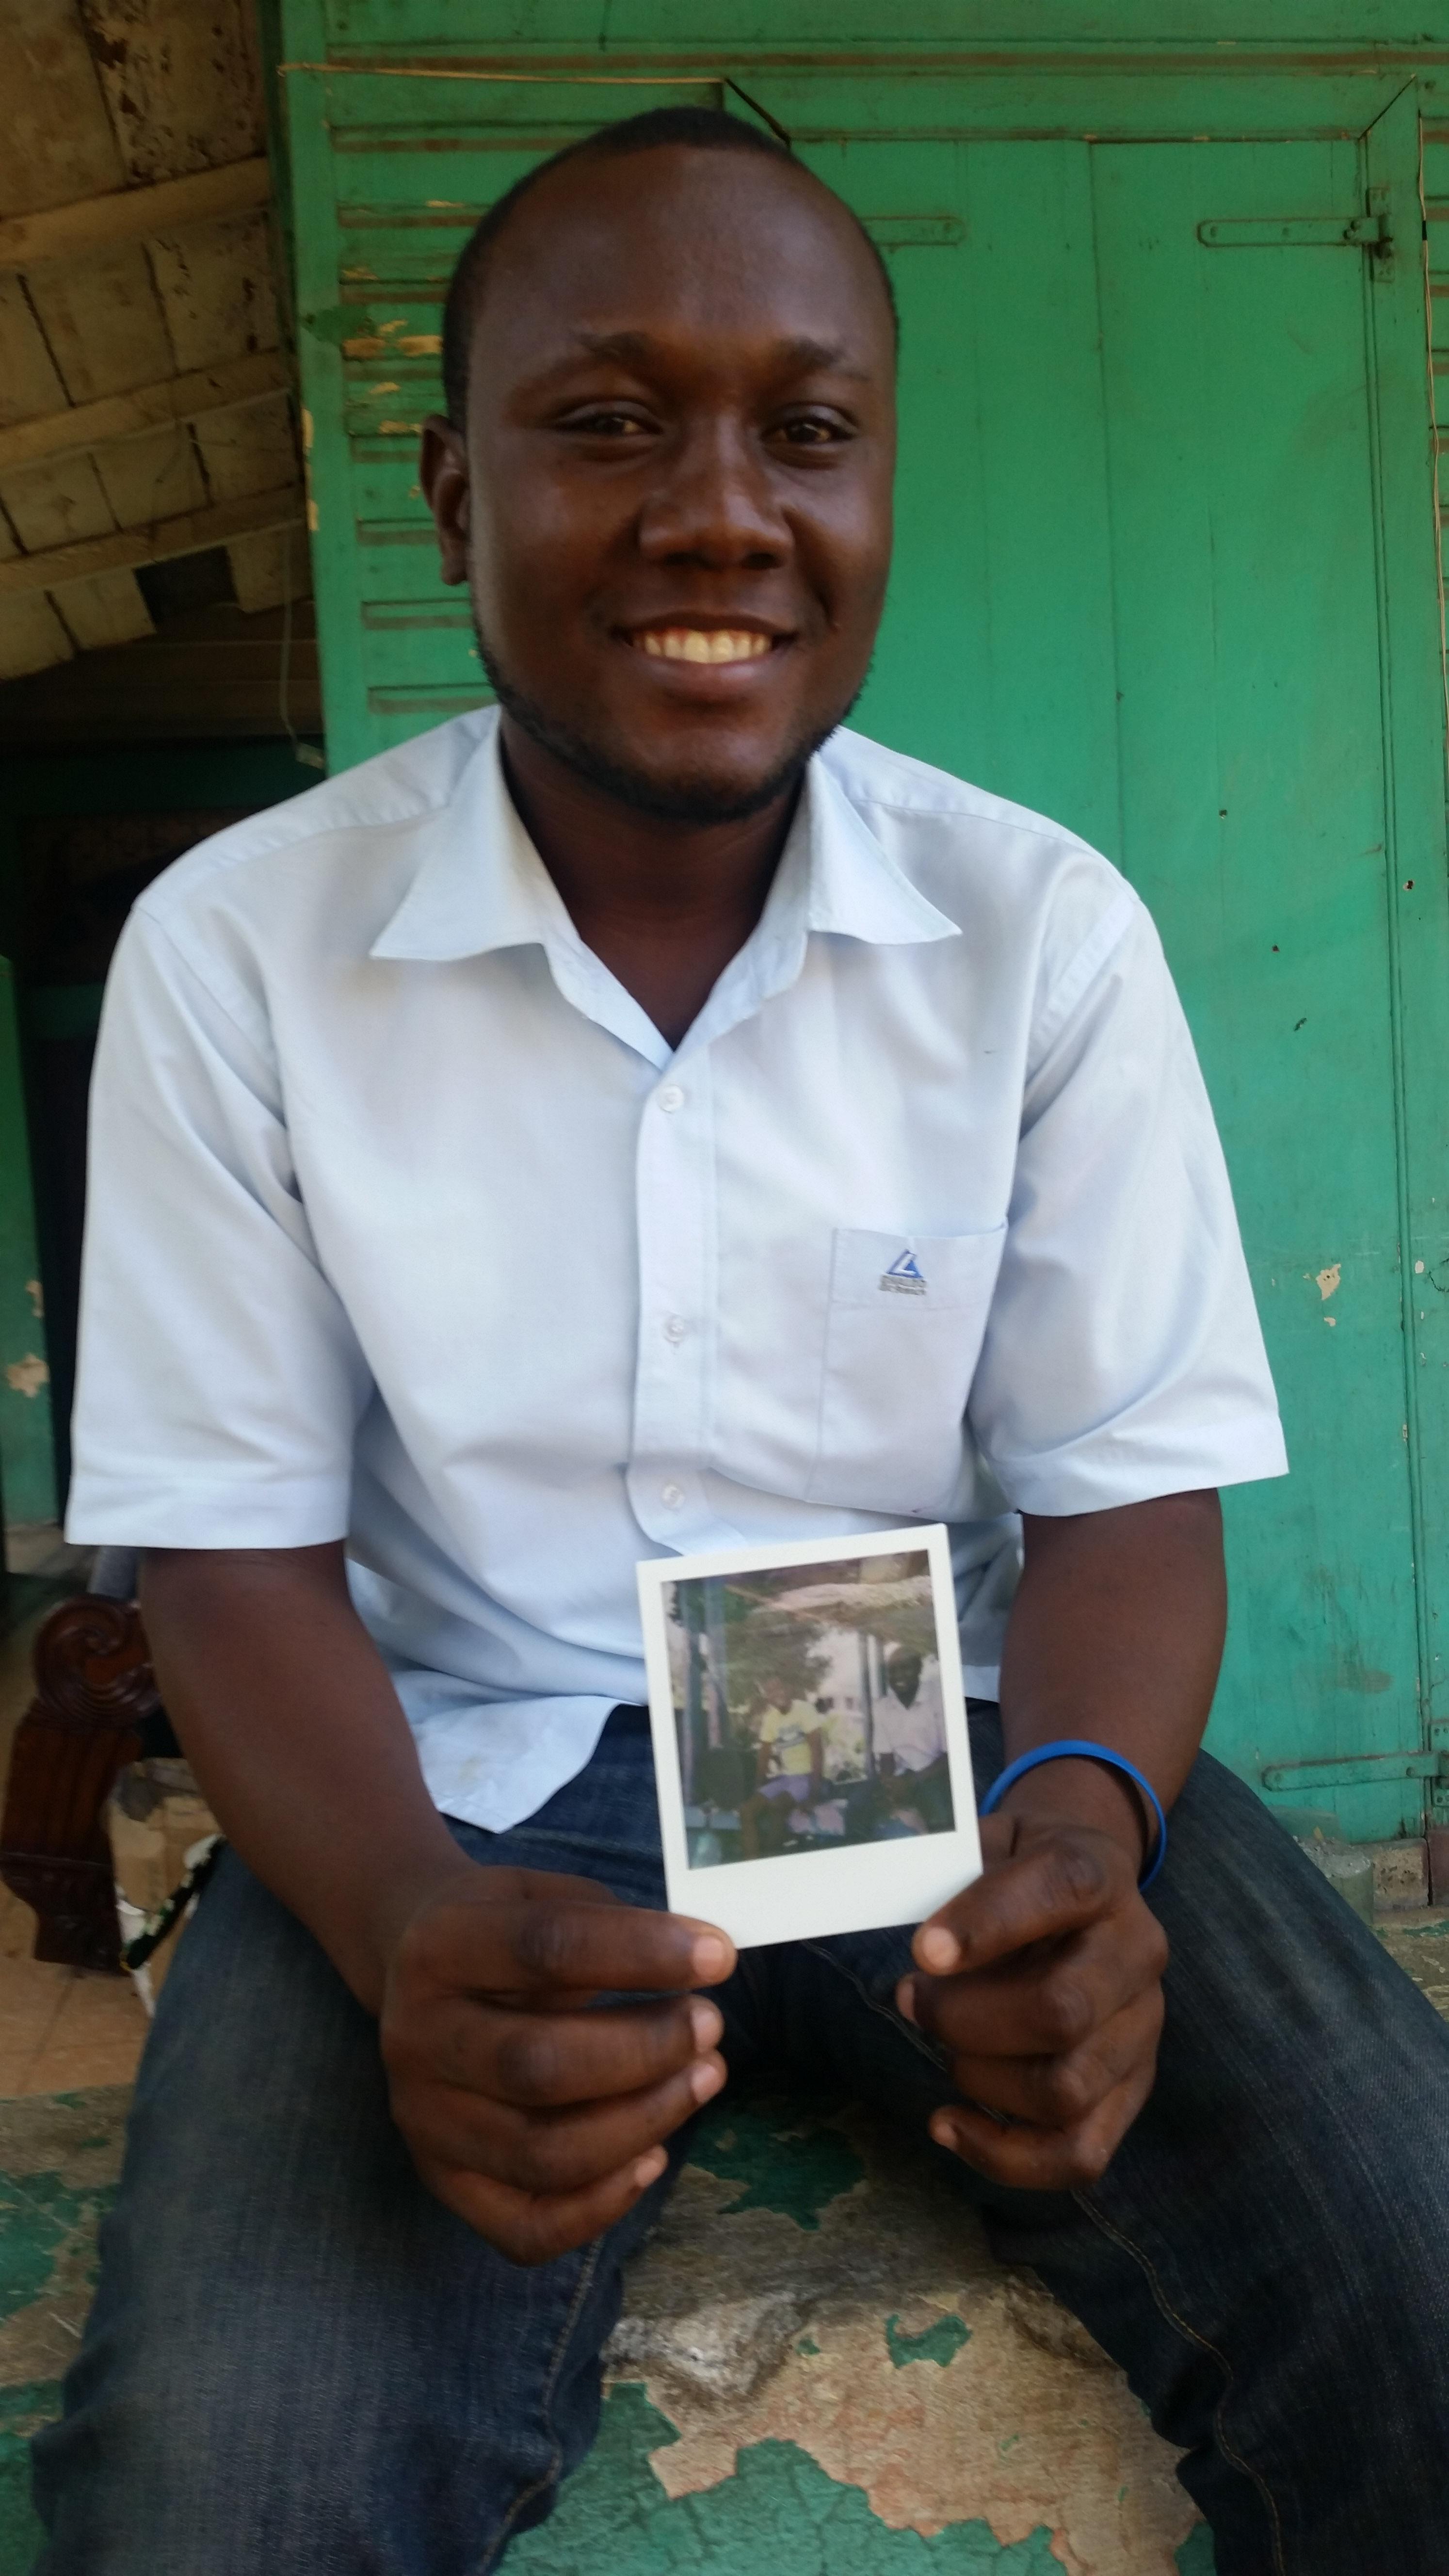 2018 Polaroid Project Haiti